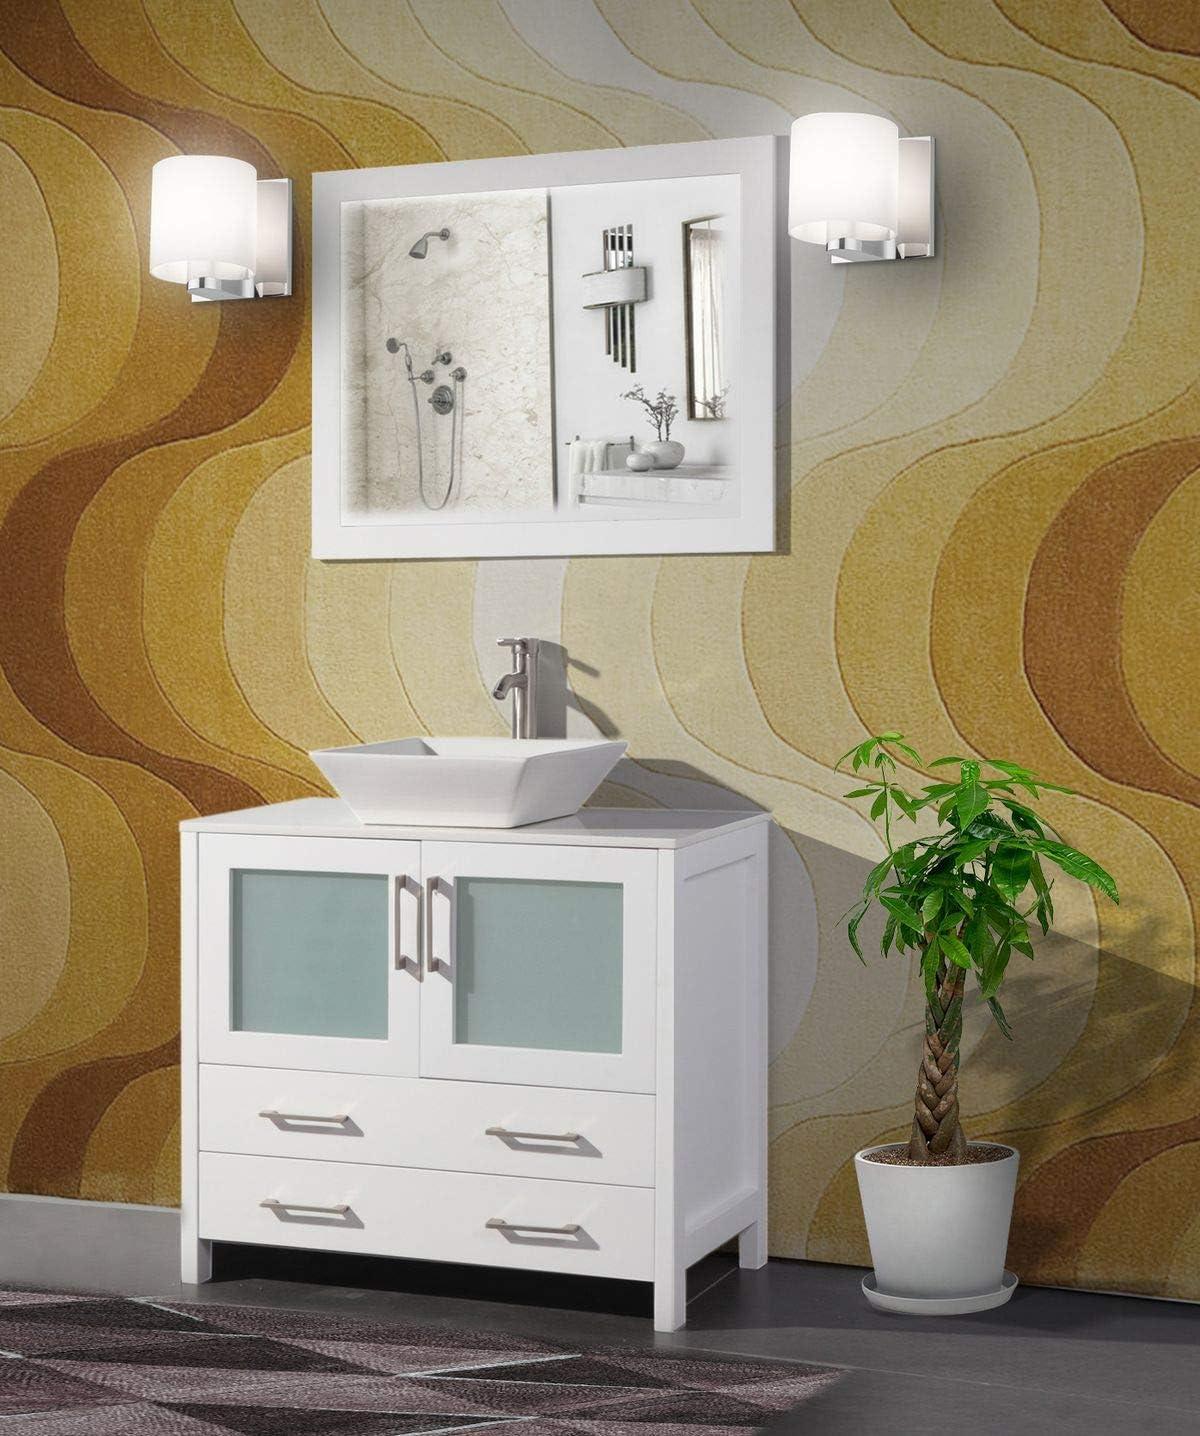 Amazon Com Vanity Art 36 Inch Single Sink Bathroom Vanity Set 1 Shelf 2 Drawers 1 Cabinet Quartz Top And Ceramic Vessel Sink Bathroom Cabinet With Free Mirror Va3136 W Kitchen Dining